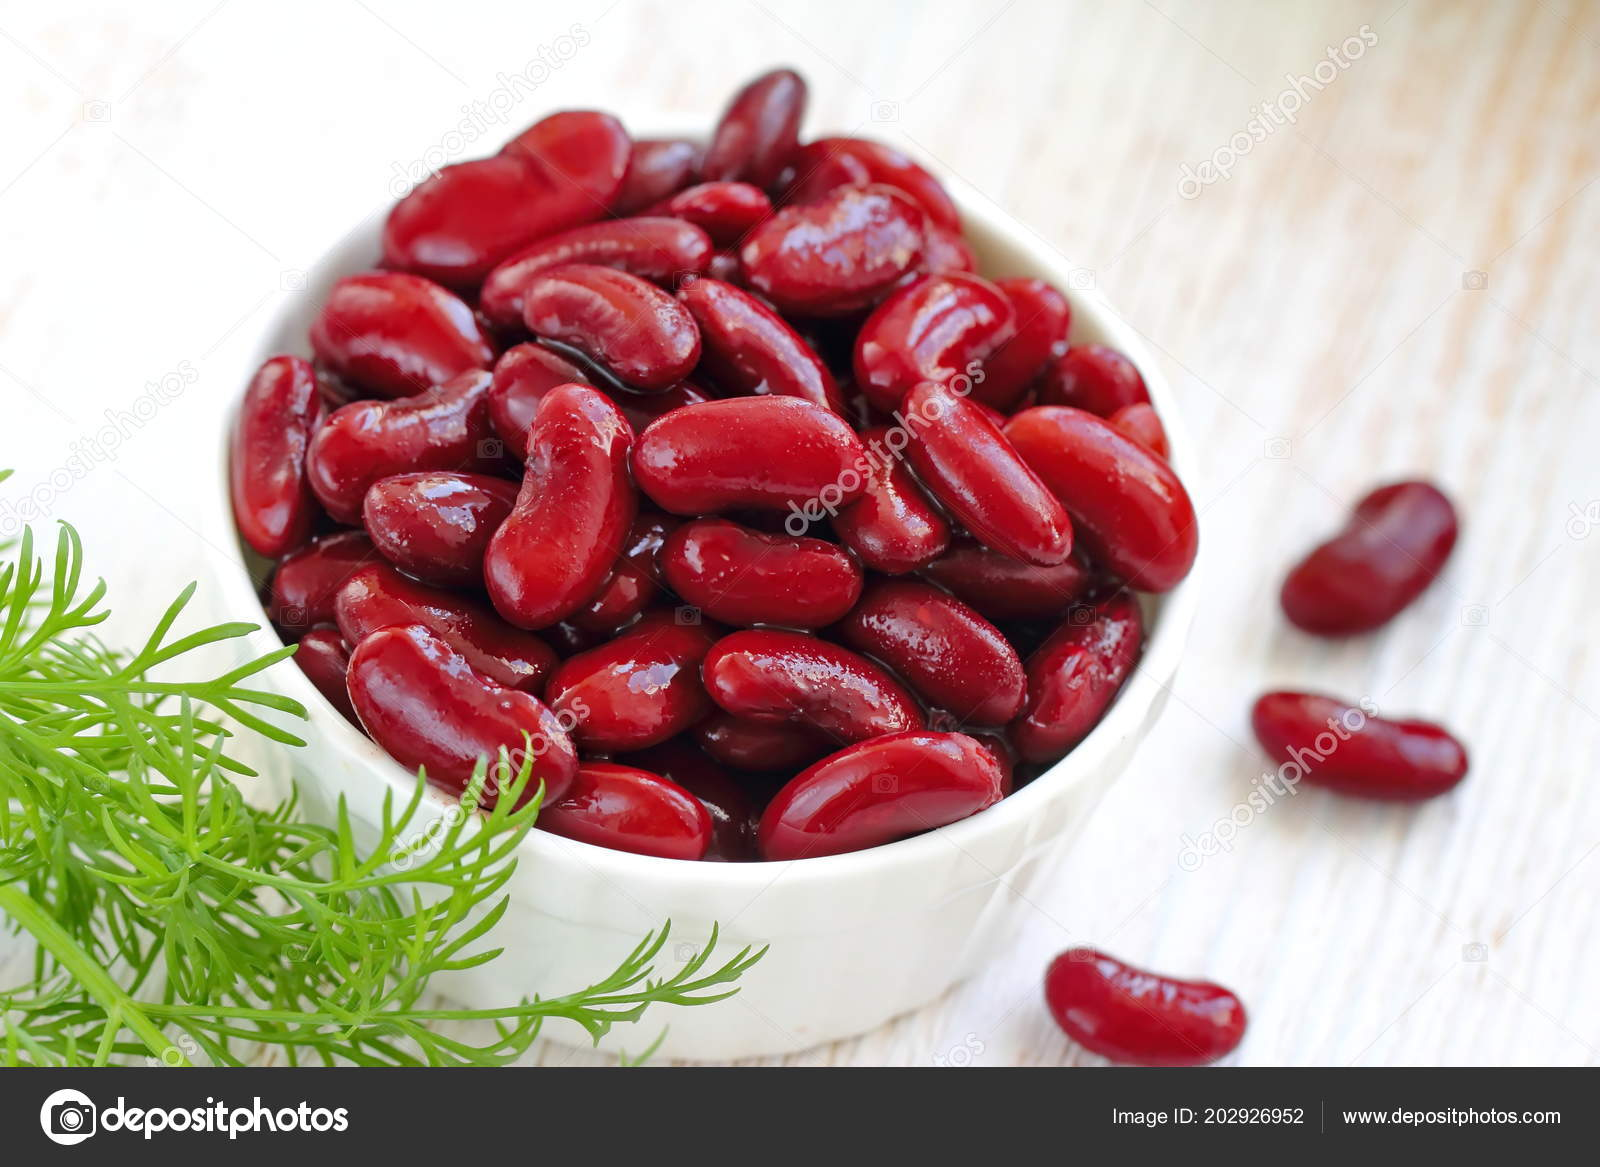 Boiled Red Kidney Beans White Bowl Stock Photo C Lisaamc 202926952